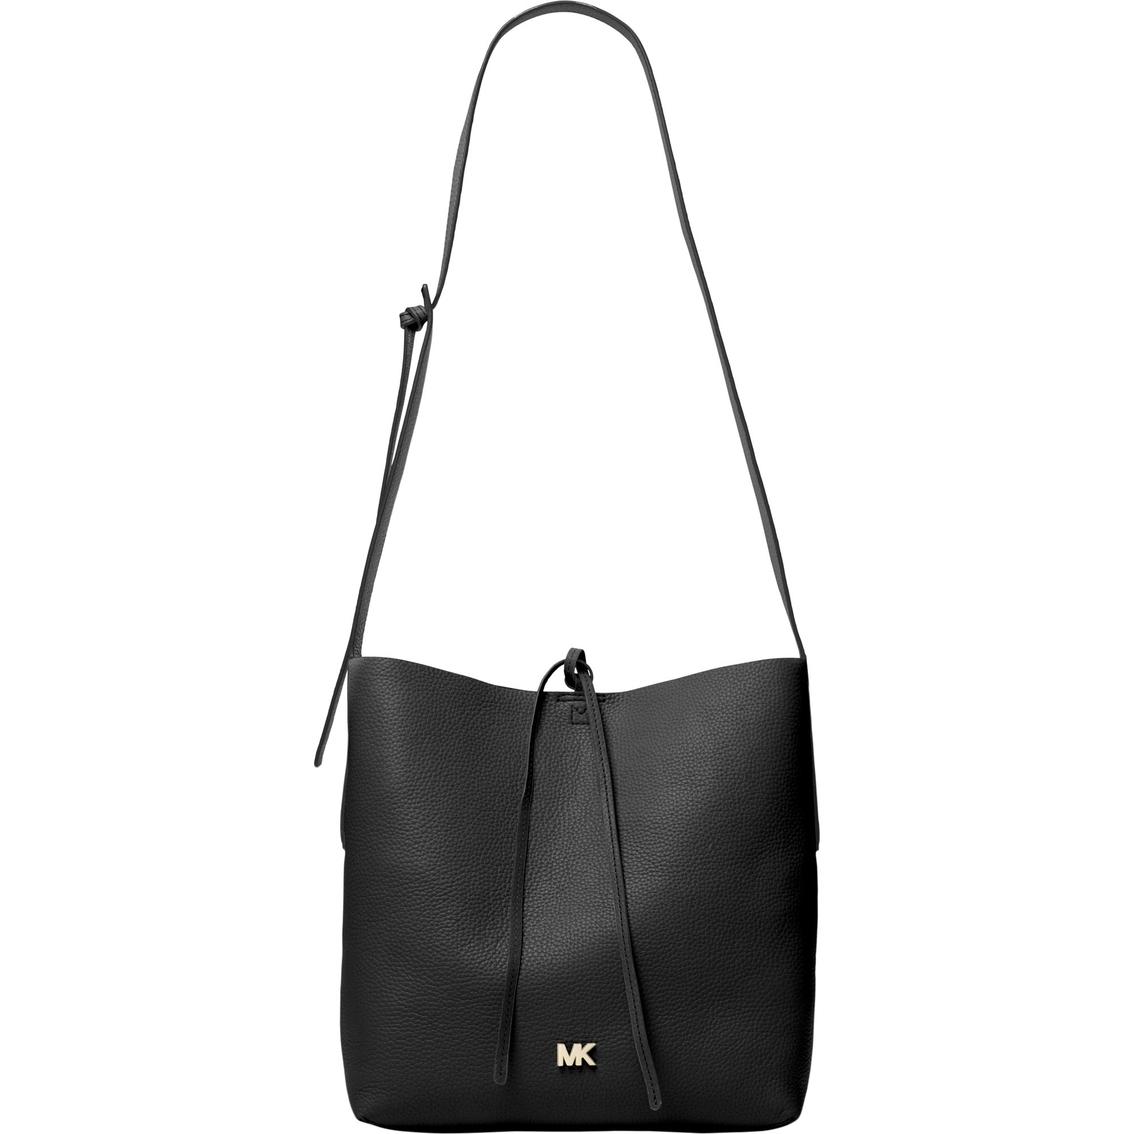 3b2a65bad6a518 Michael Kors Junie Leather Large Messenger Bag | Messenger Bags ...